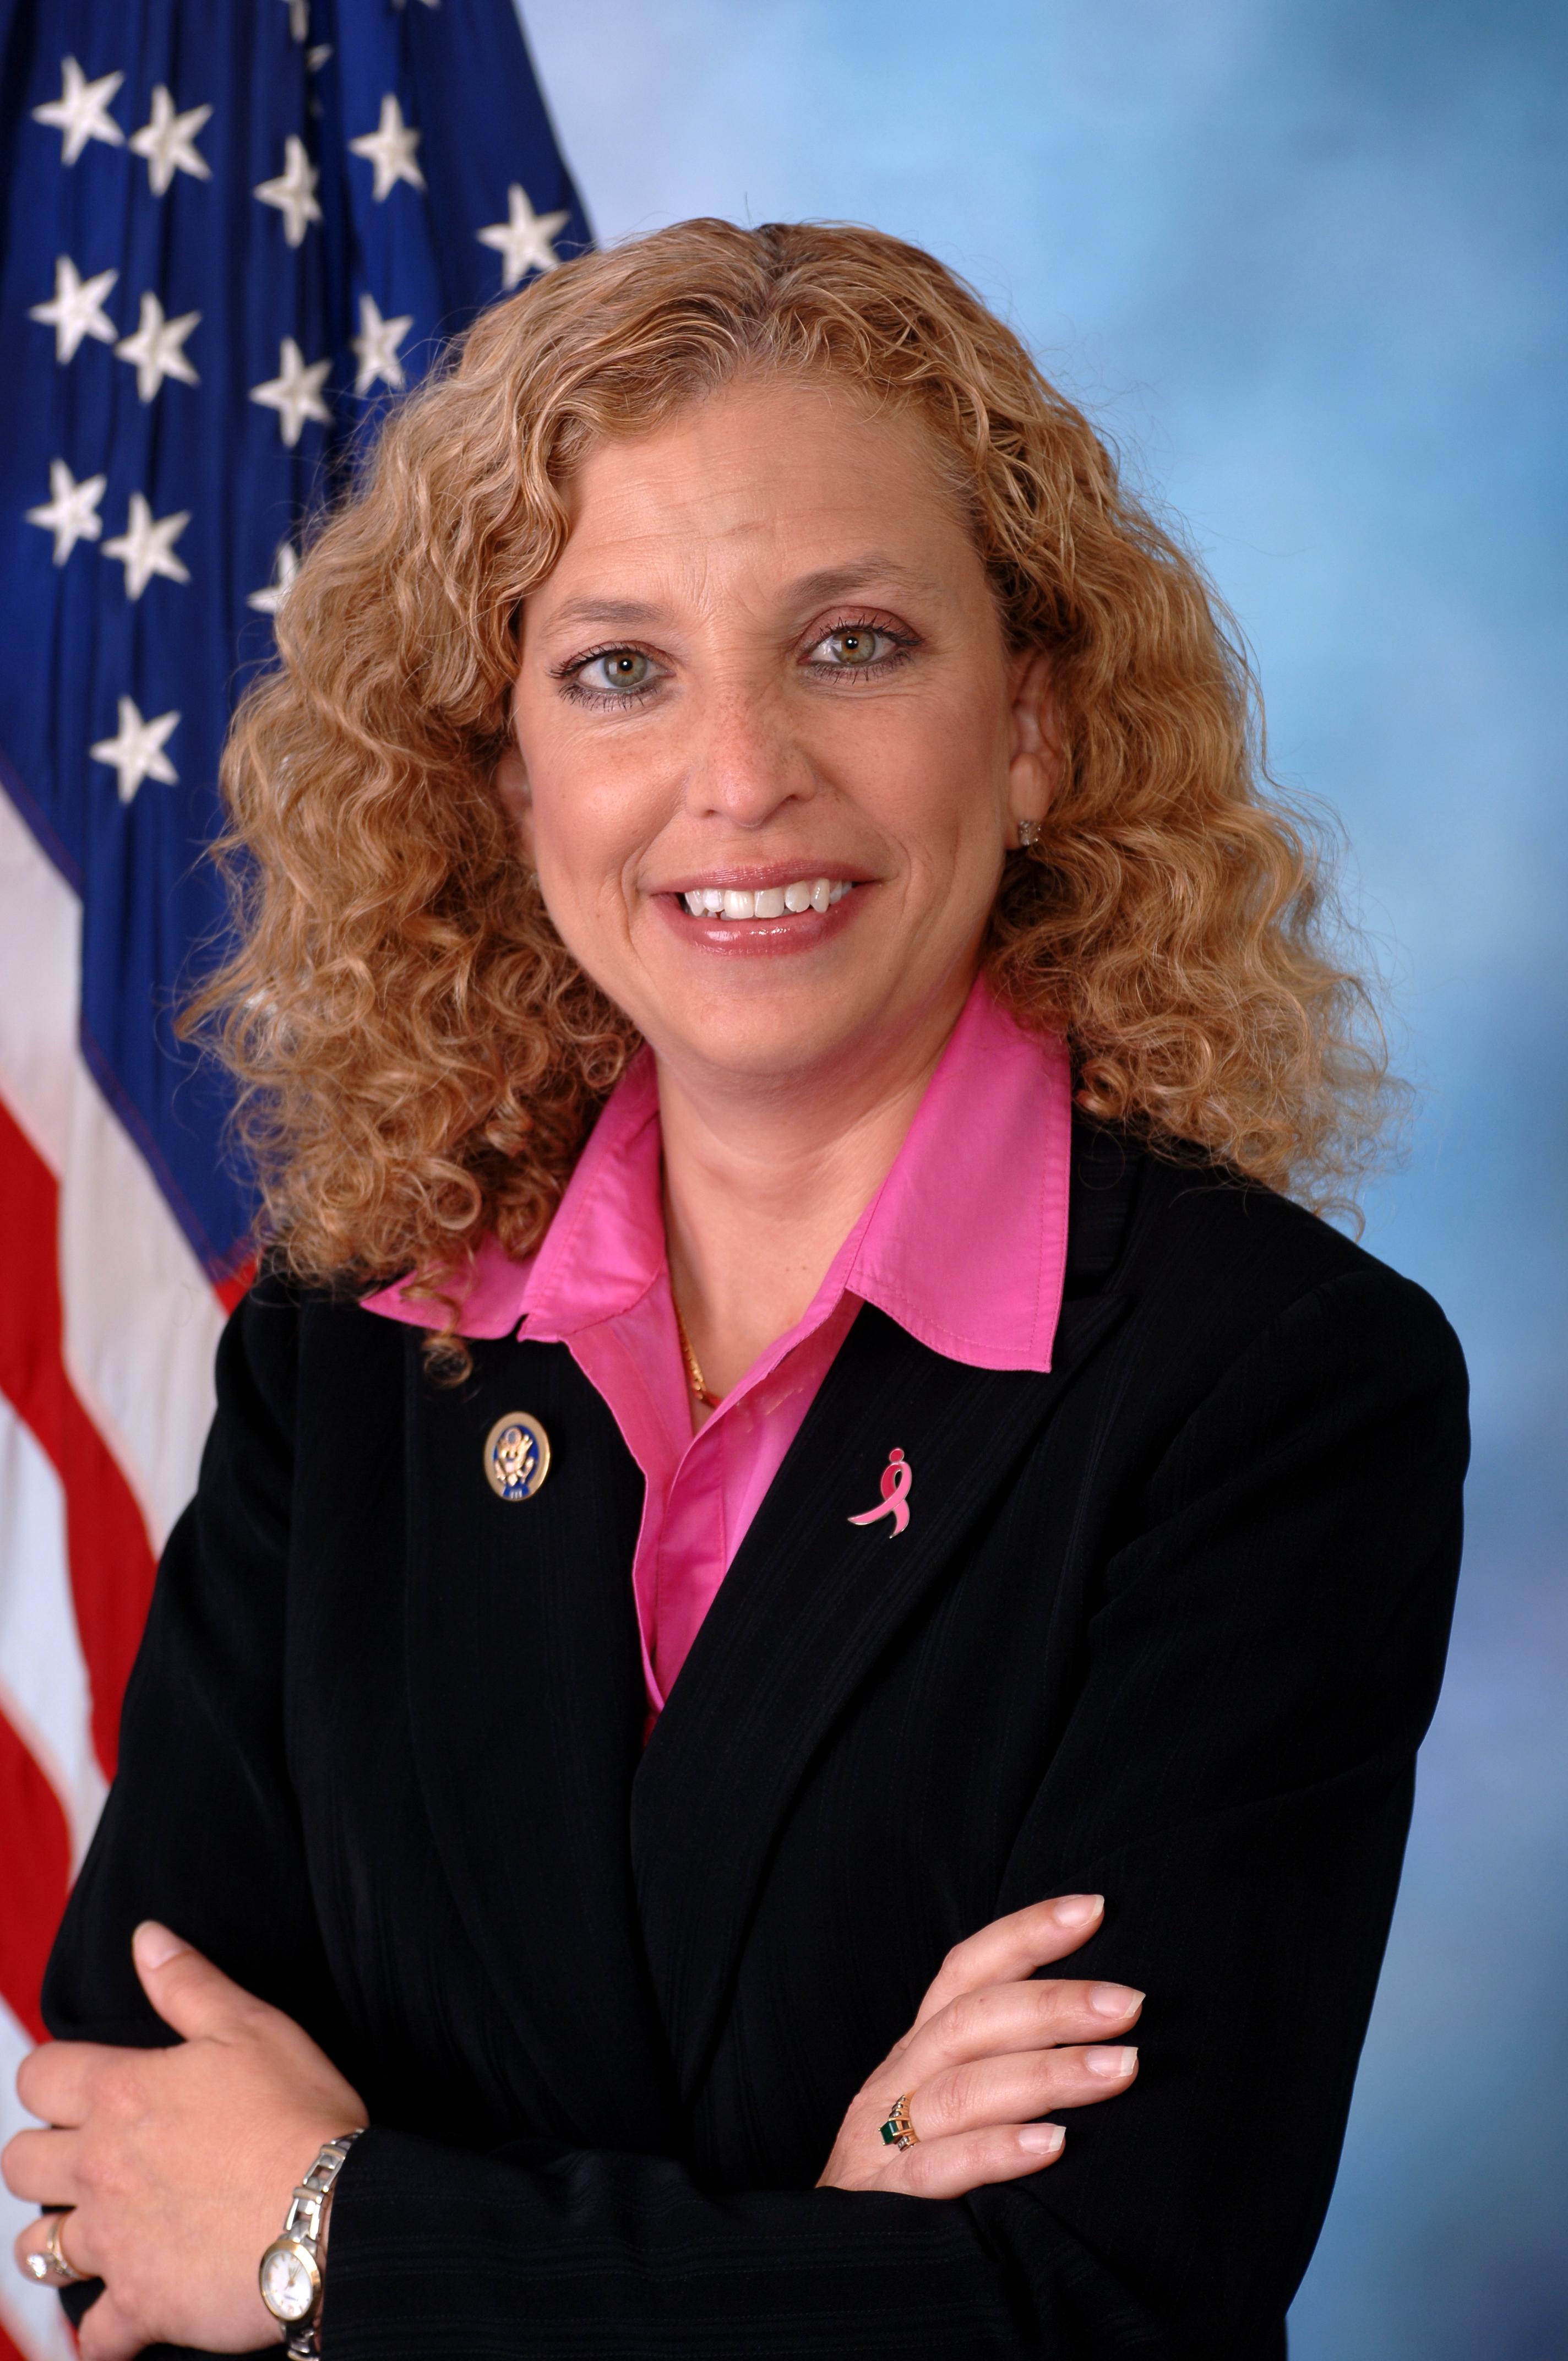 https://upload.wikimedia.org/wikipedia/commons/e/eb/Debbie_Wasserman_Schultz,_official_portrait,_112th_Congress.jpg